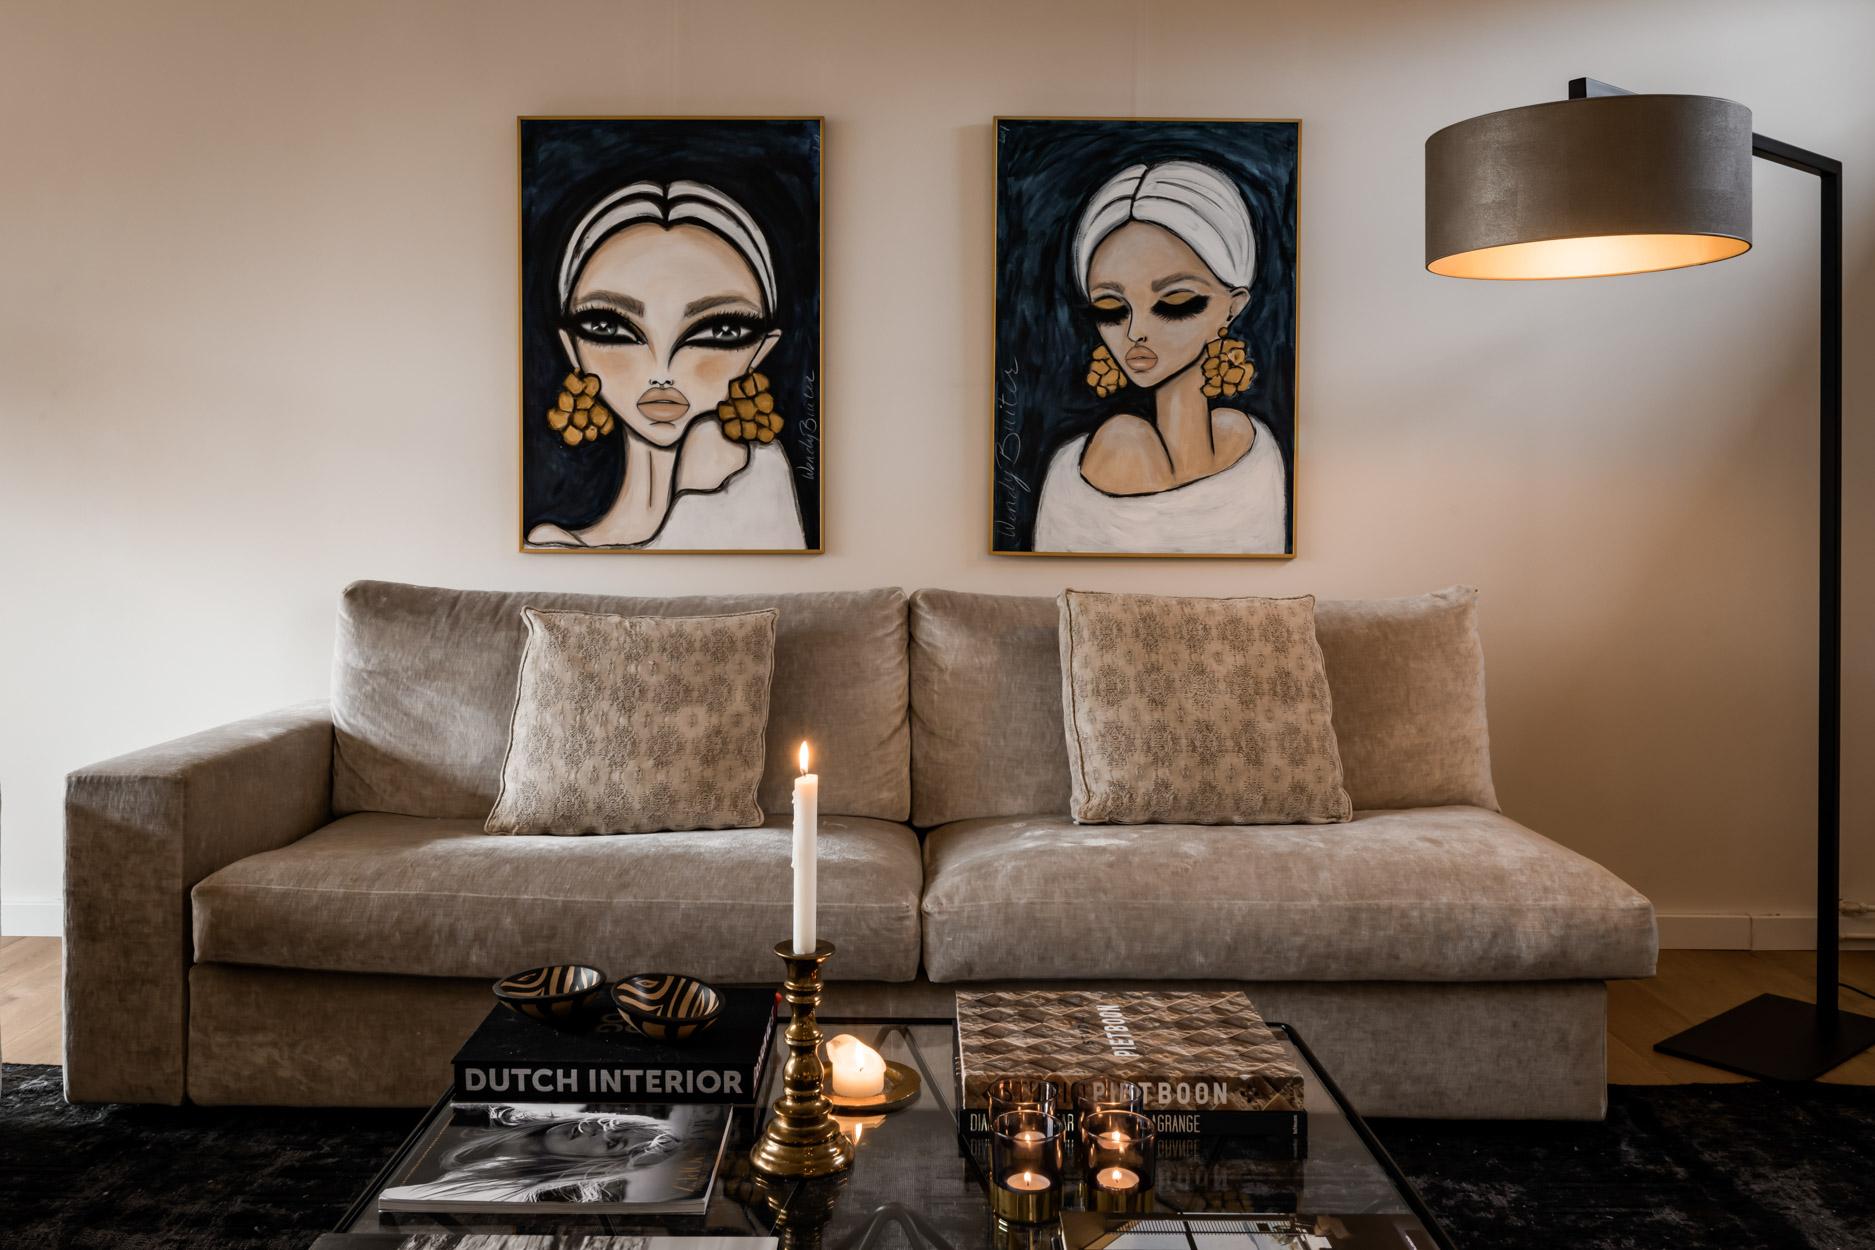 Studio Flabbergasted Portfolio - Fotografie Chantal Hoozemans